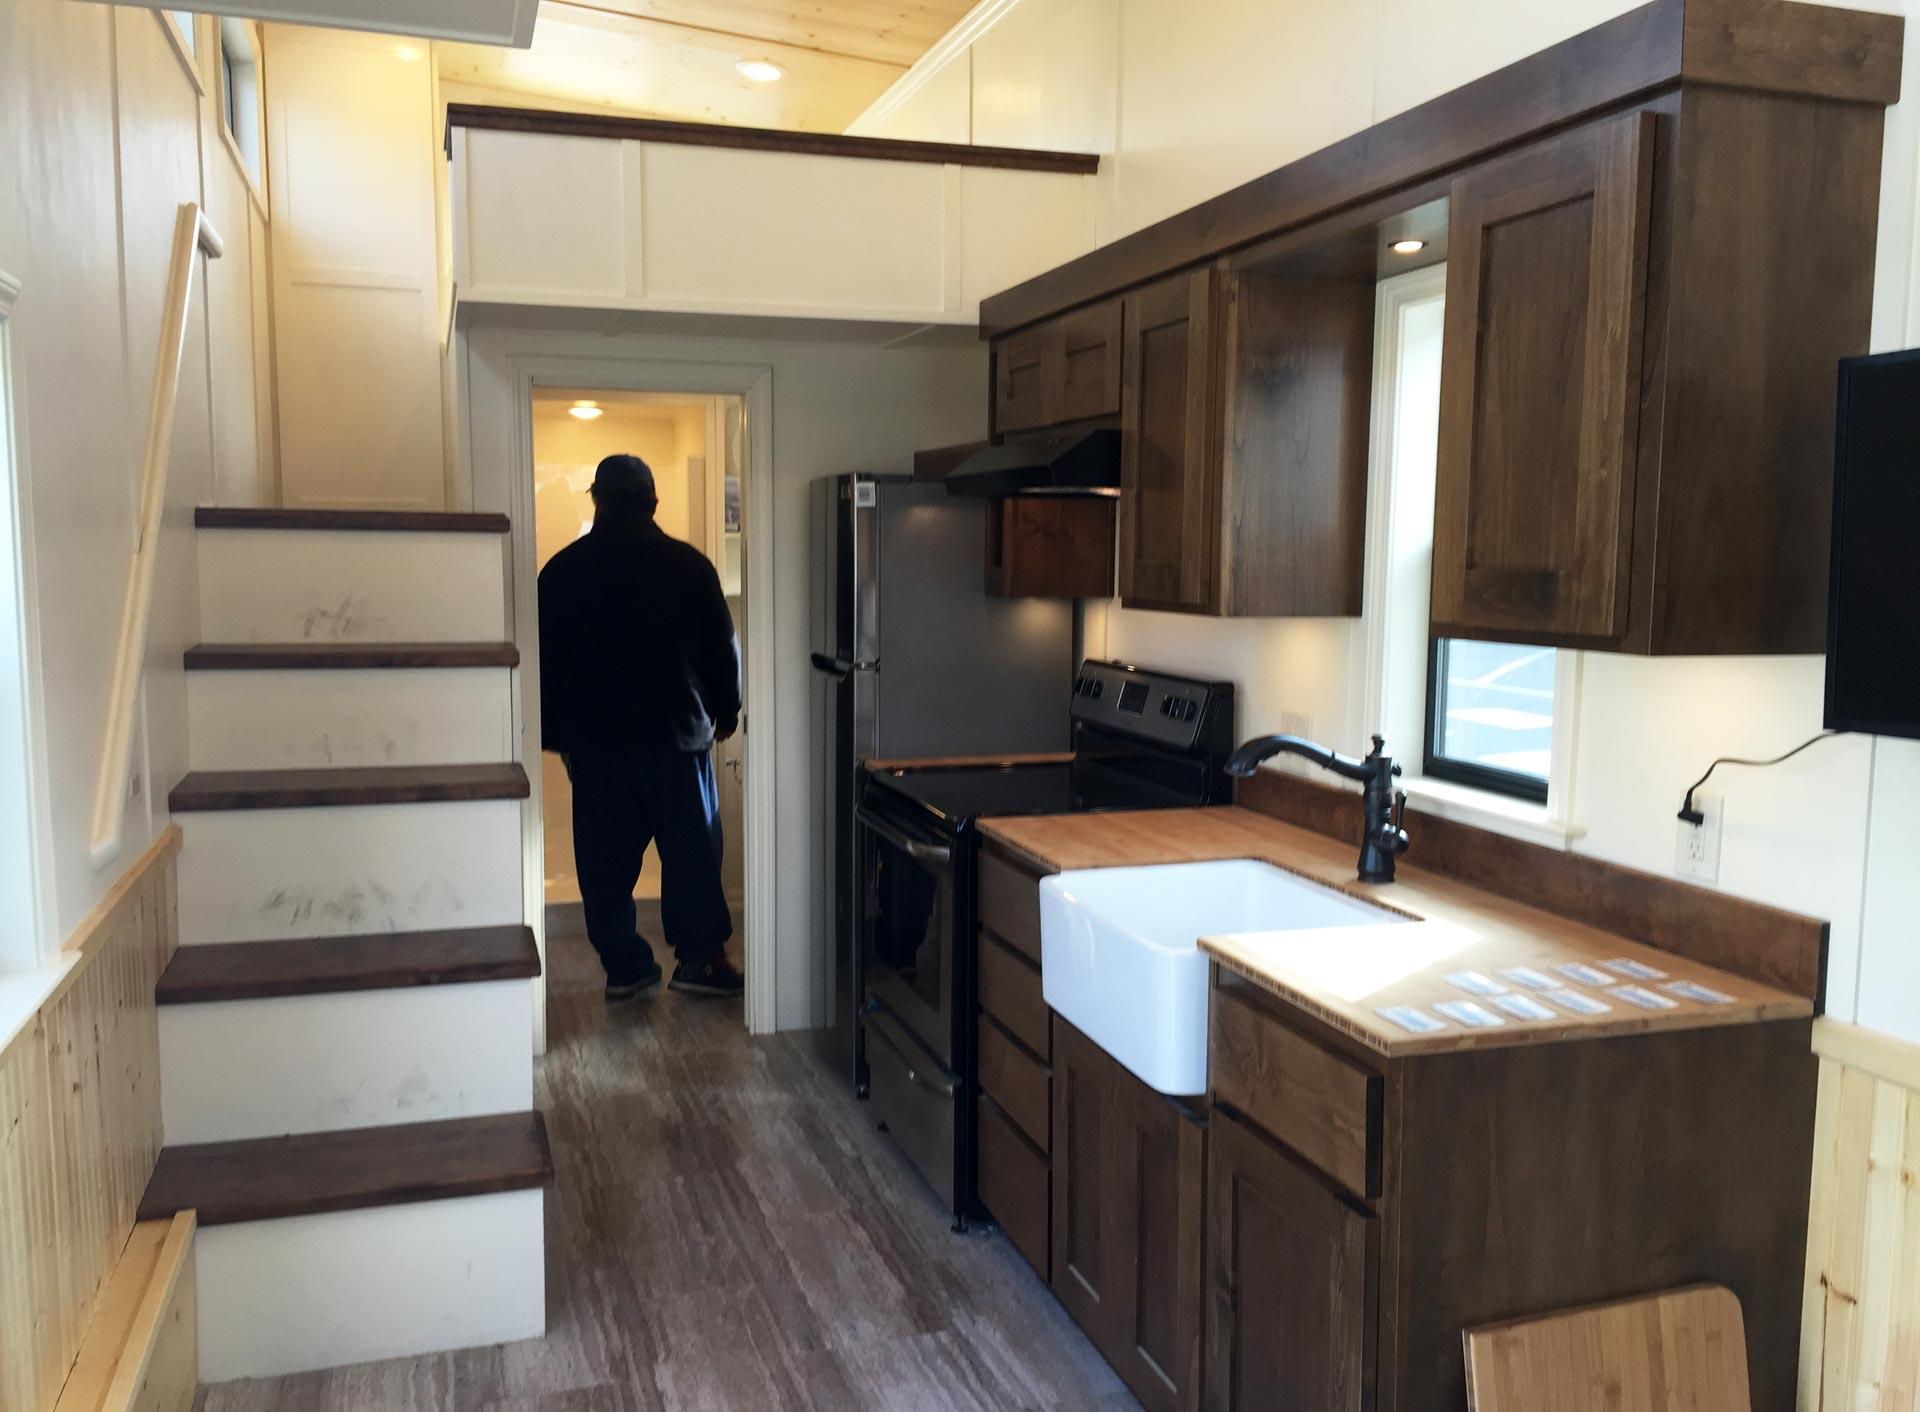 Tiny Home Designs: Fresno Passes Groundbreaking 'Tiny House' Rules